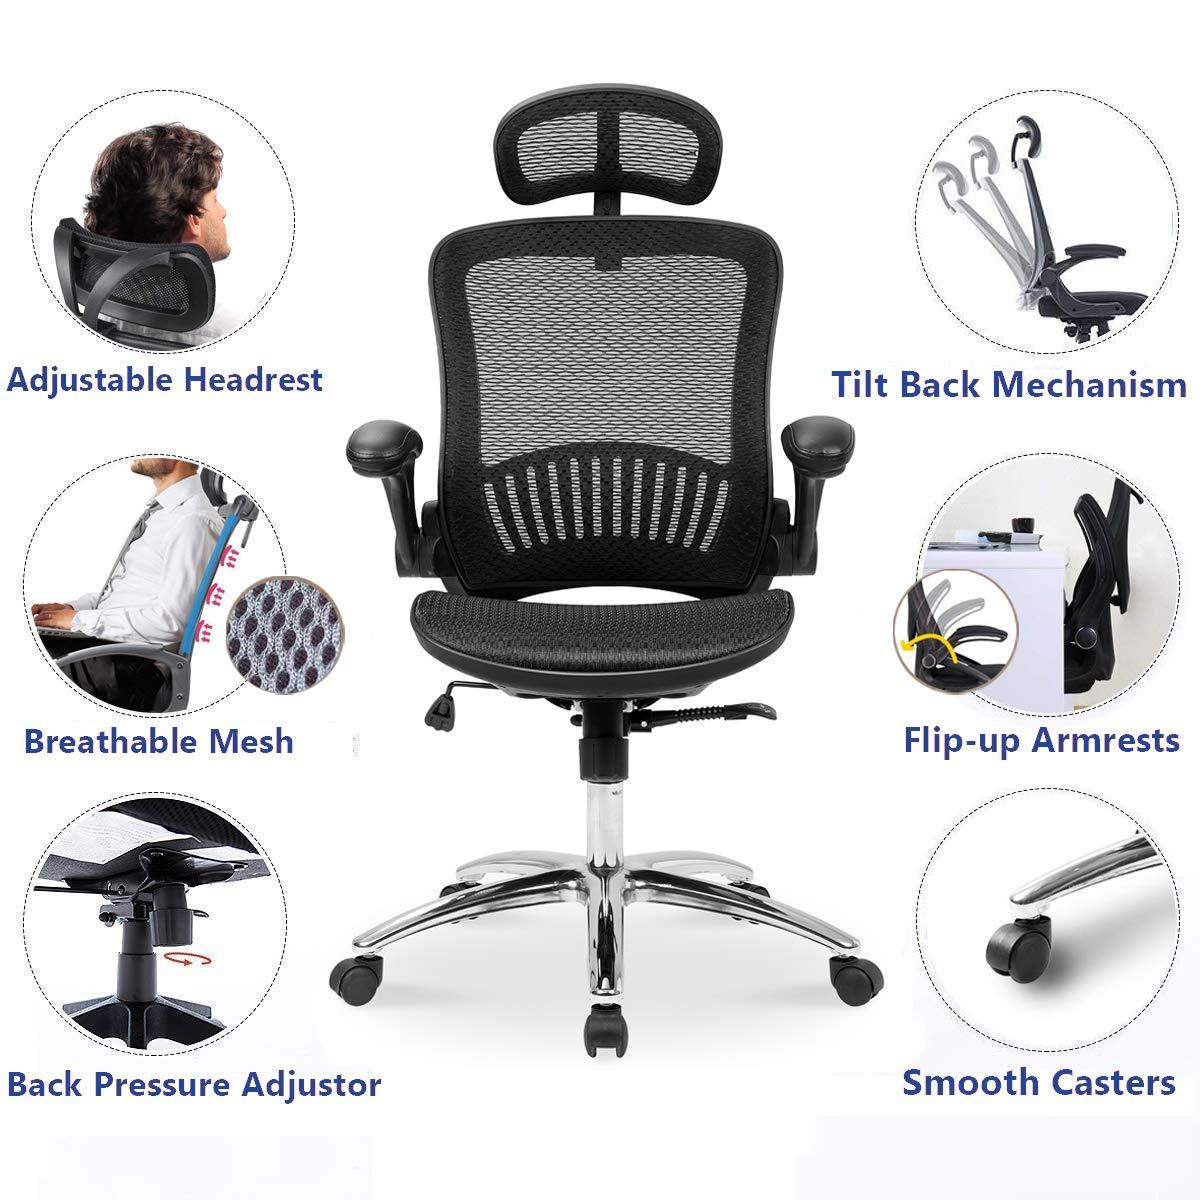 Merax Ergonomic Mesh Adjustable Home Desk Chair Office Chair Modern New Design Reclining Chair by Merax (Image #3)